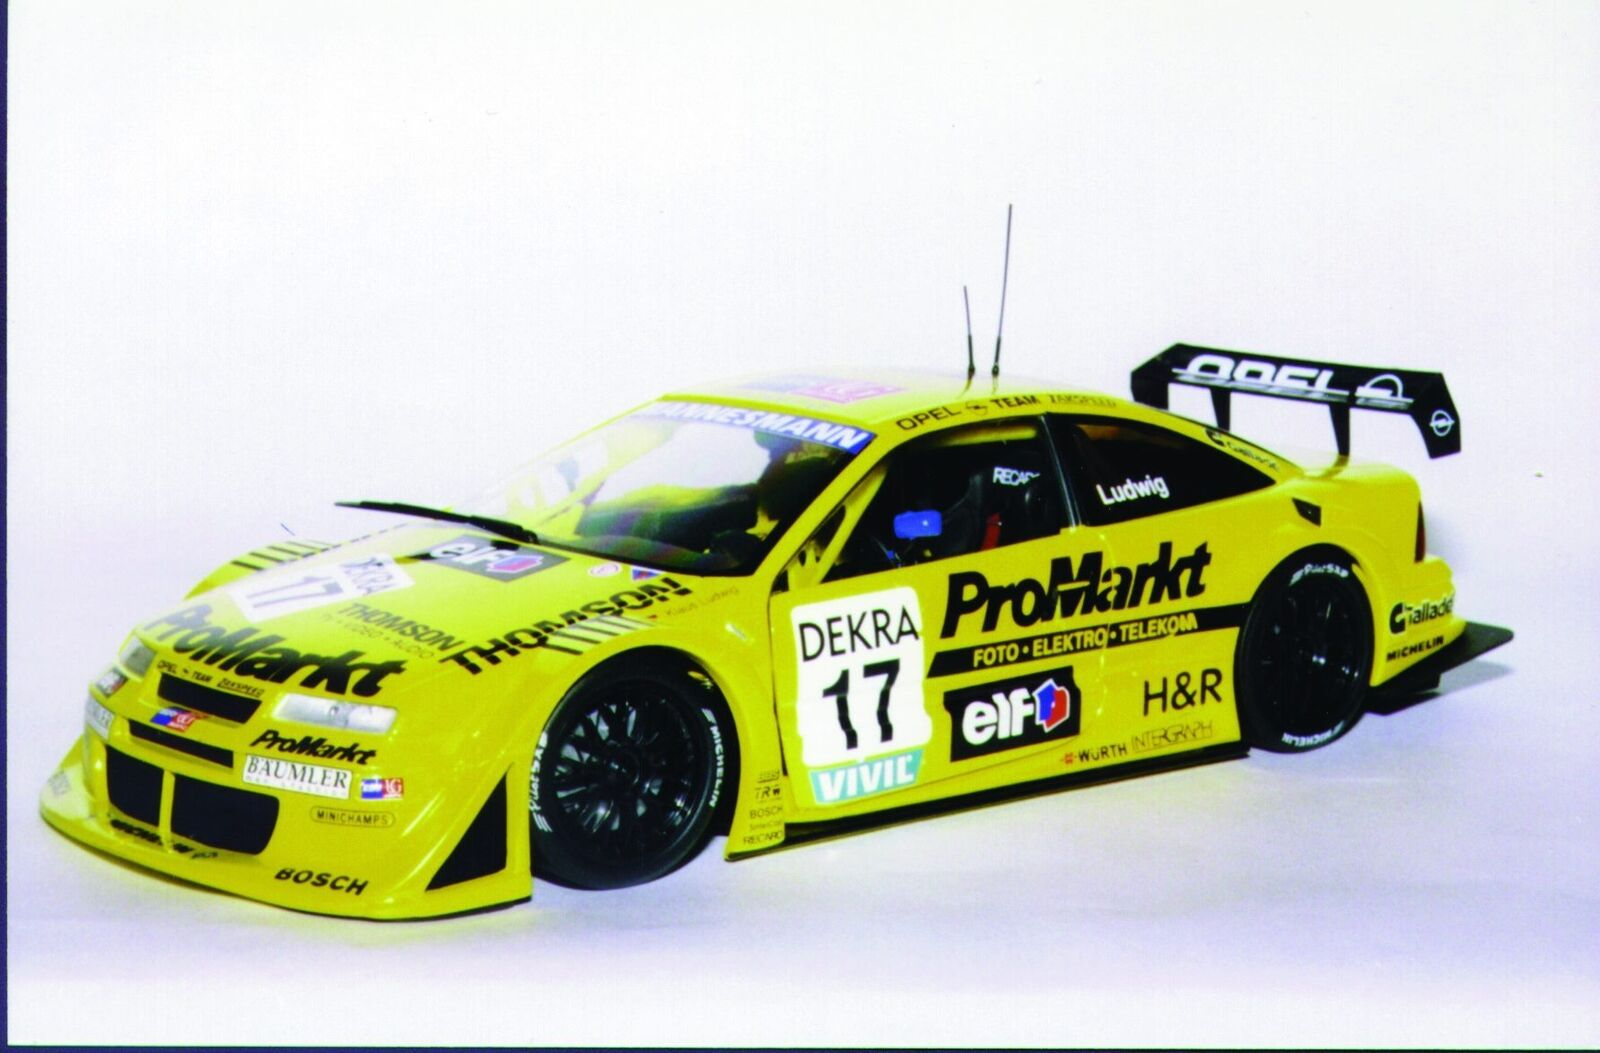 UT modelos Opel Calibra'96 17 Ludwig 'Zakspeed ProMarkt'